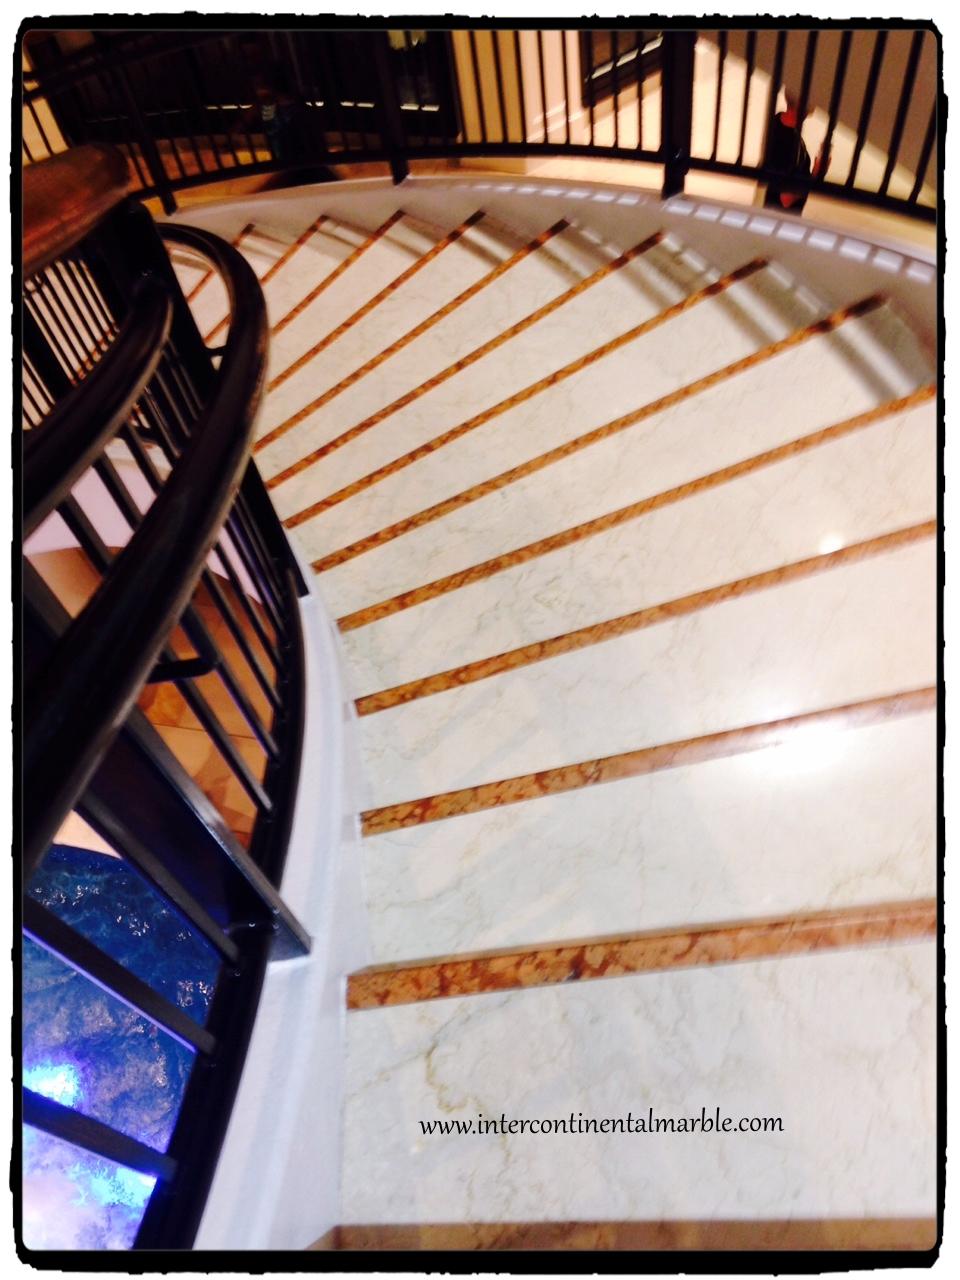 Beautiful stairs at Aventura Mall